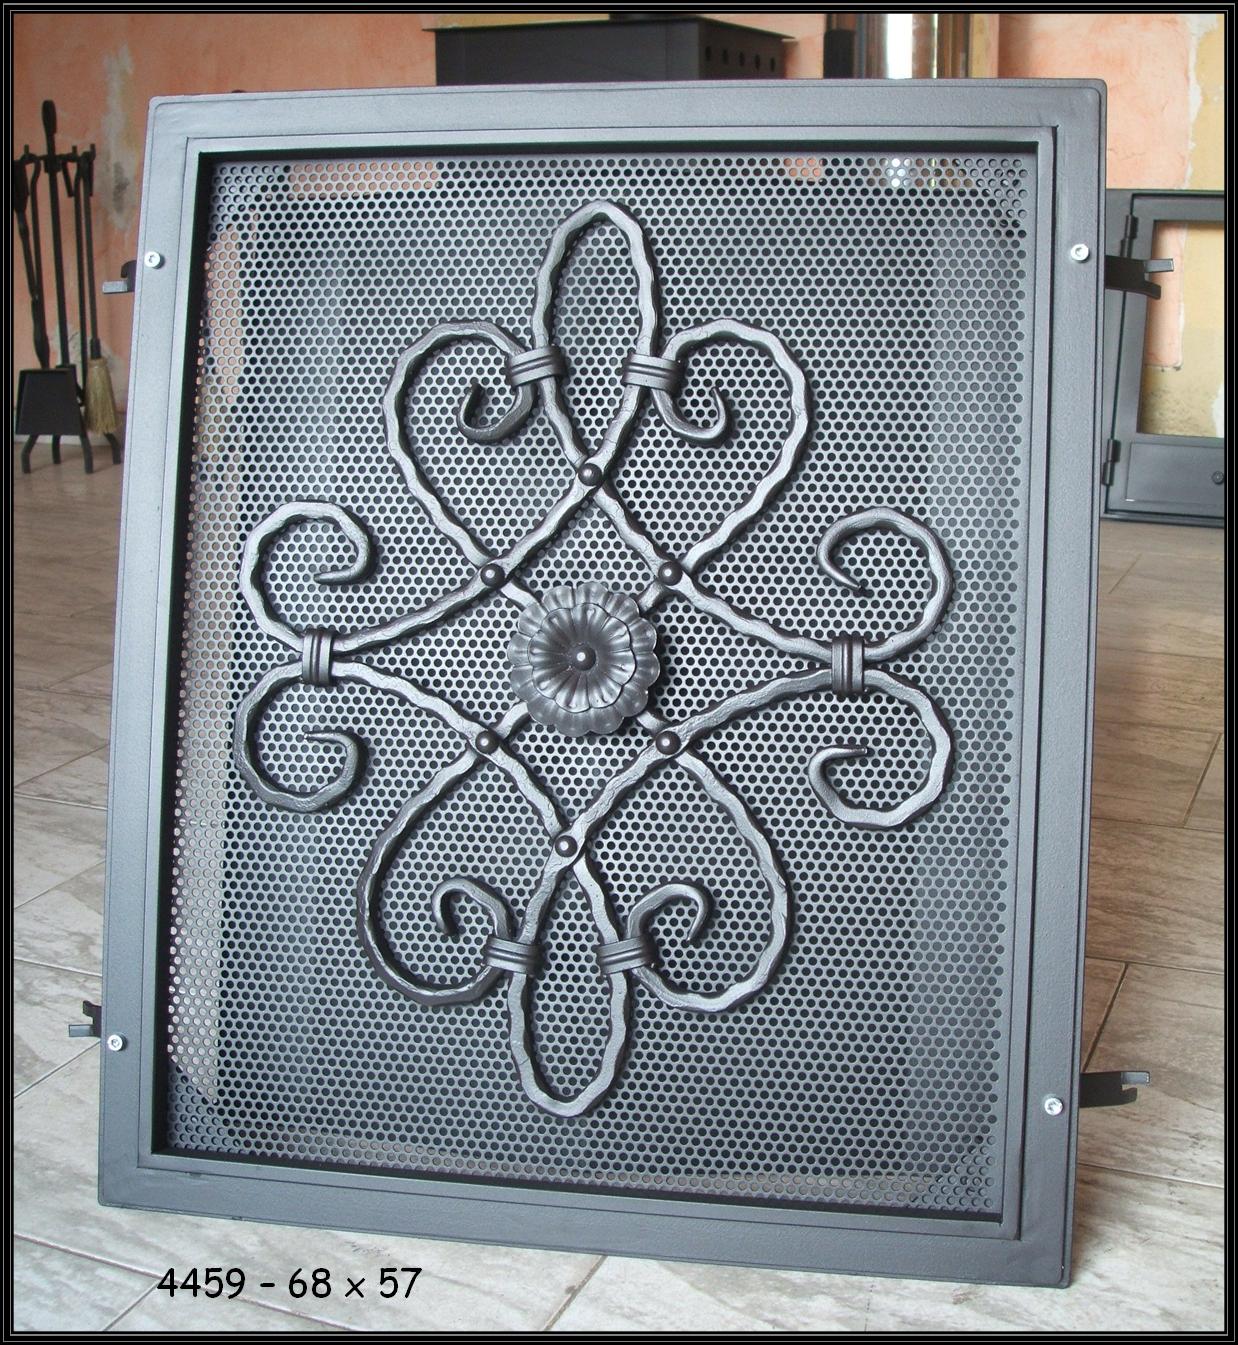 Chimeneas sierra rejillas decorativas para chimeneas - Rejilla de ventilacion regulable ...